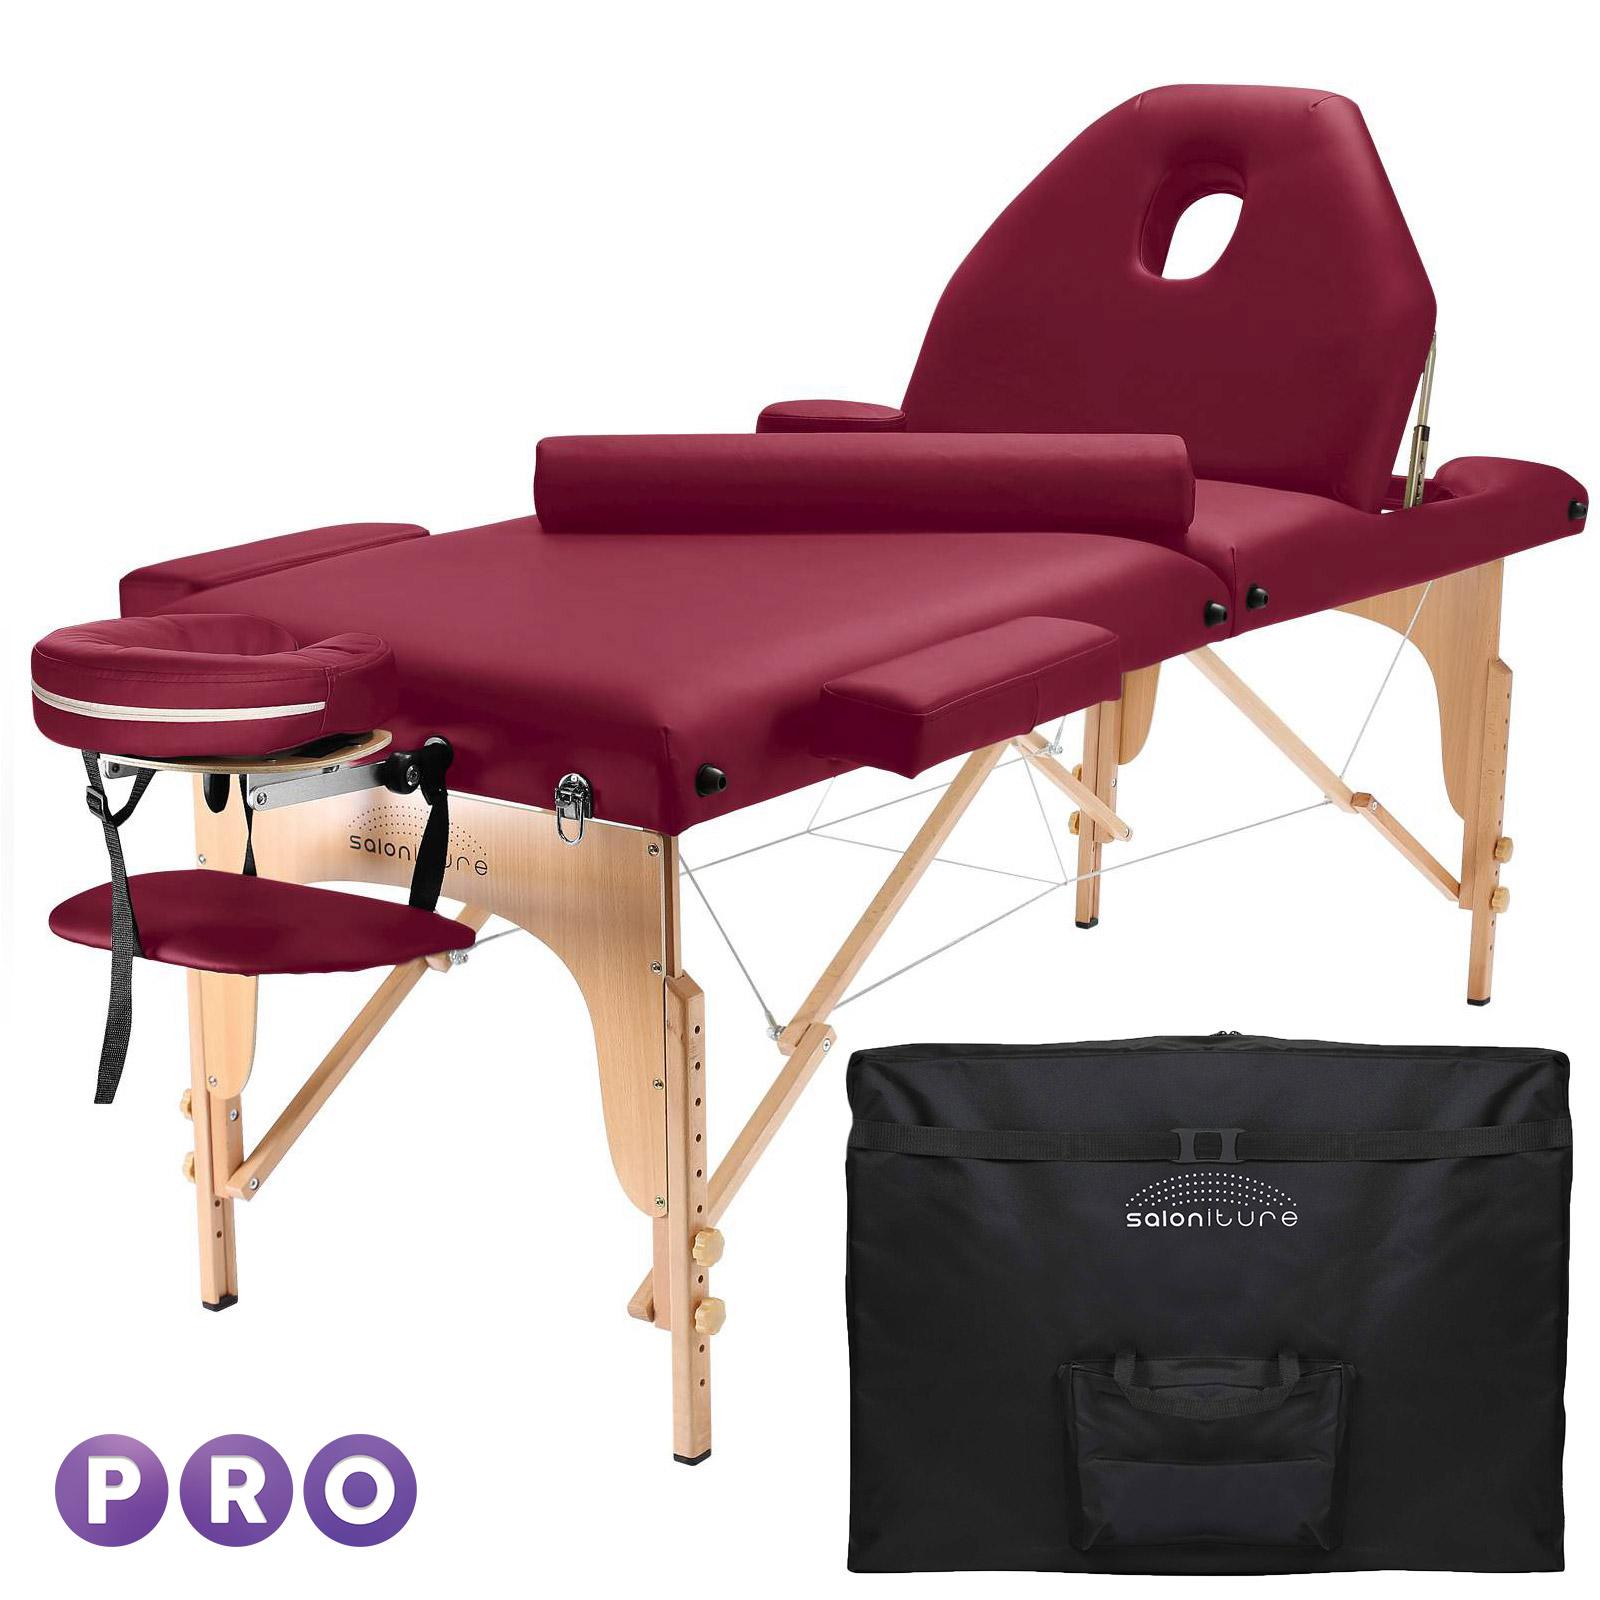 Portable Massage Table With Bolster And Tilt Backrest Ebay